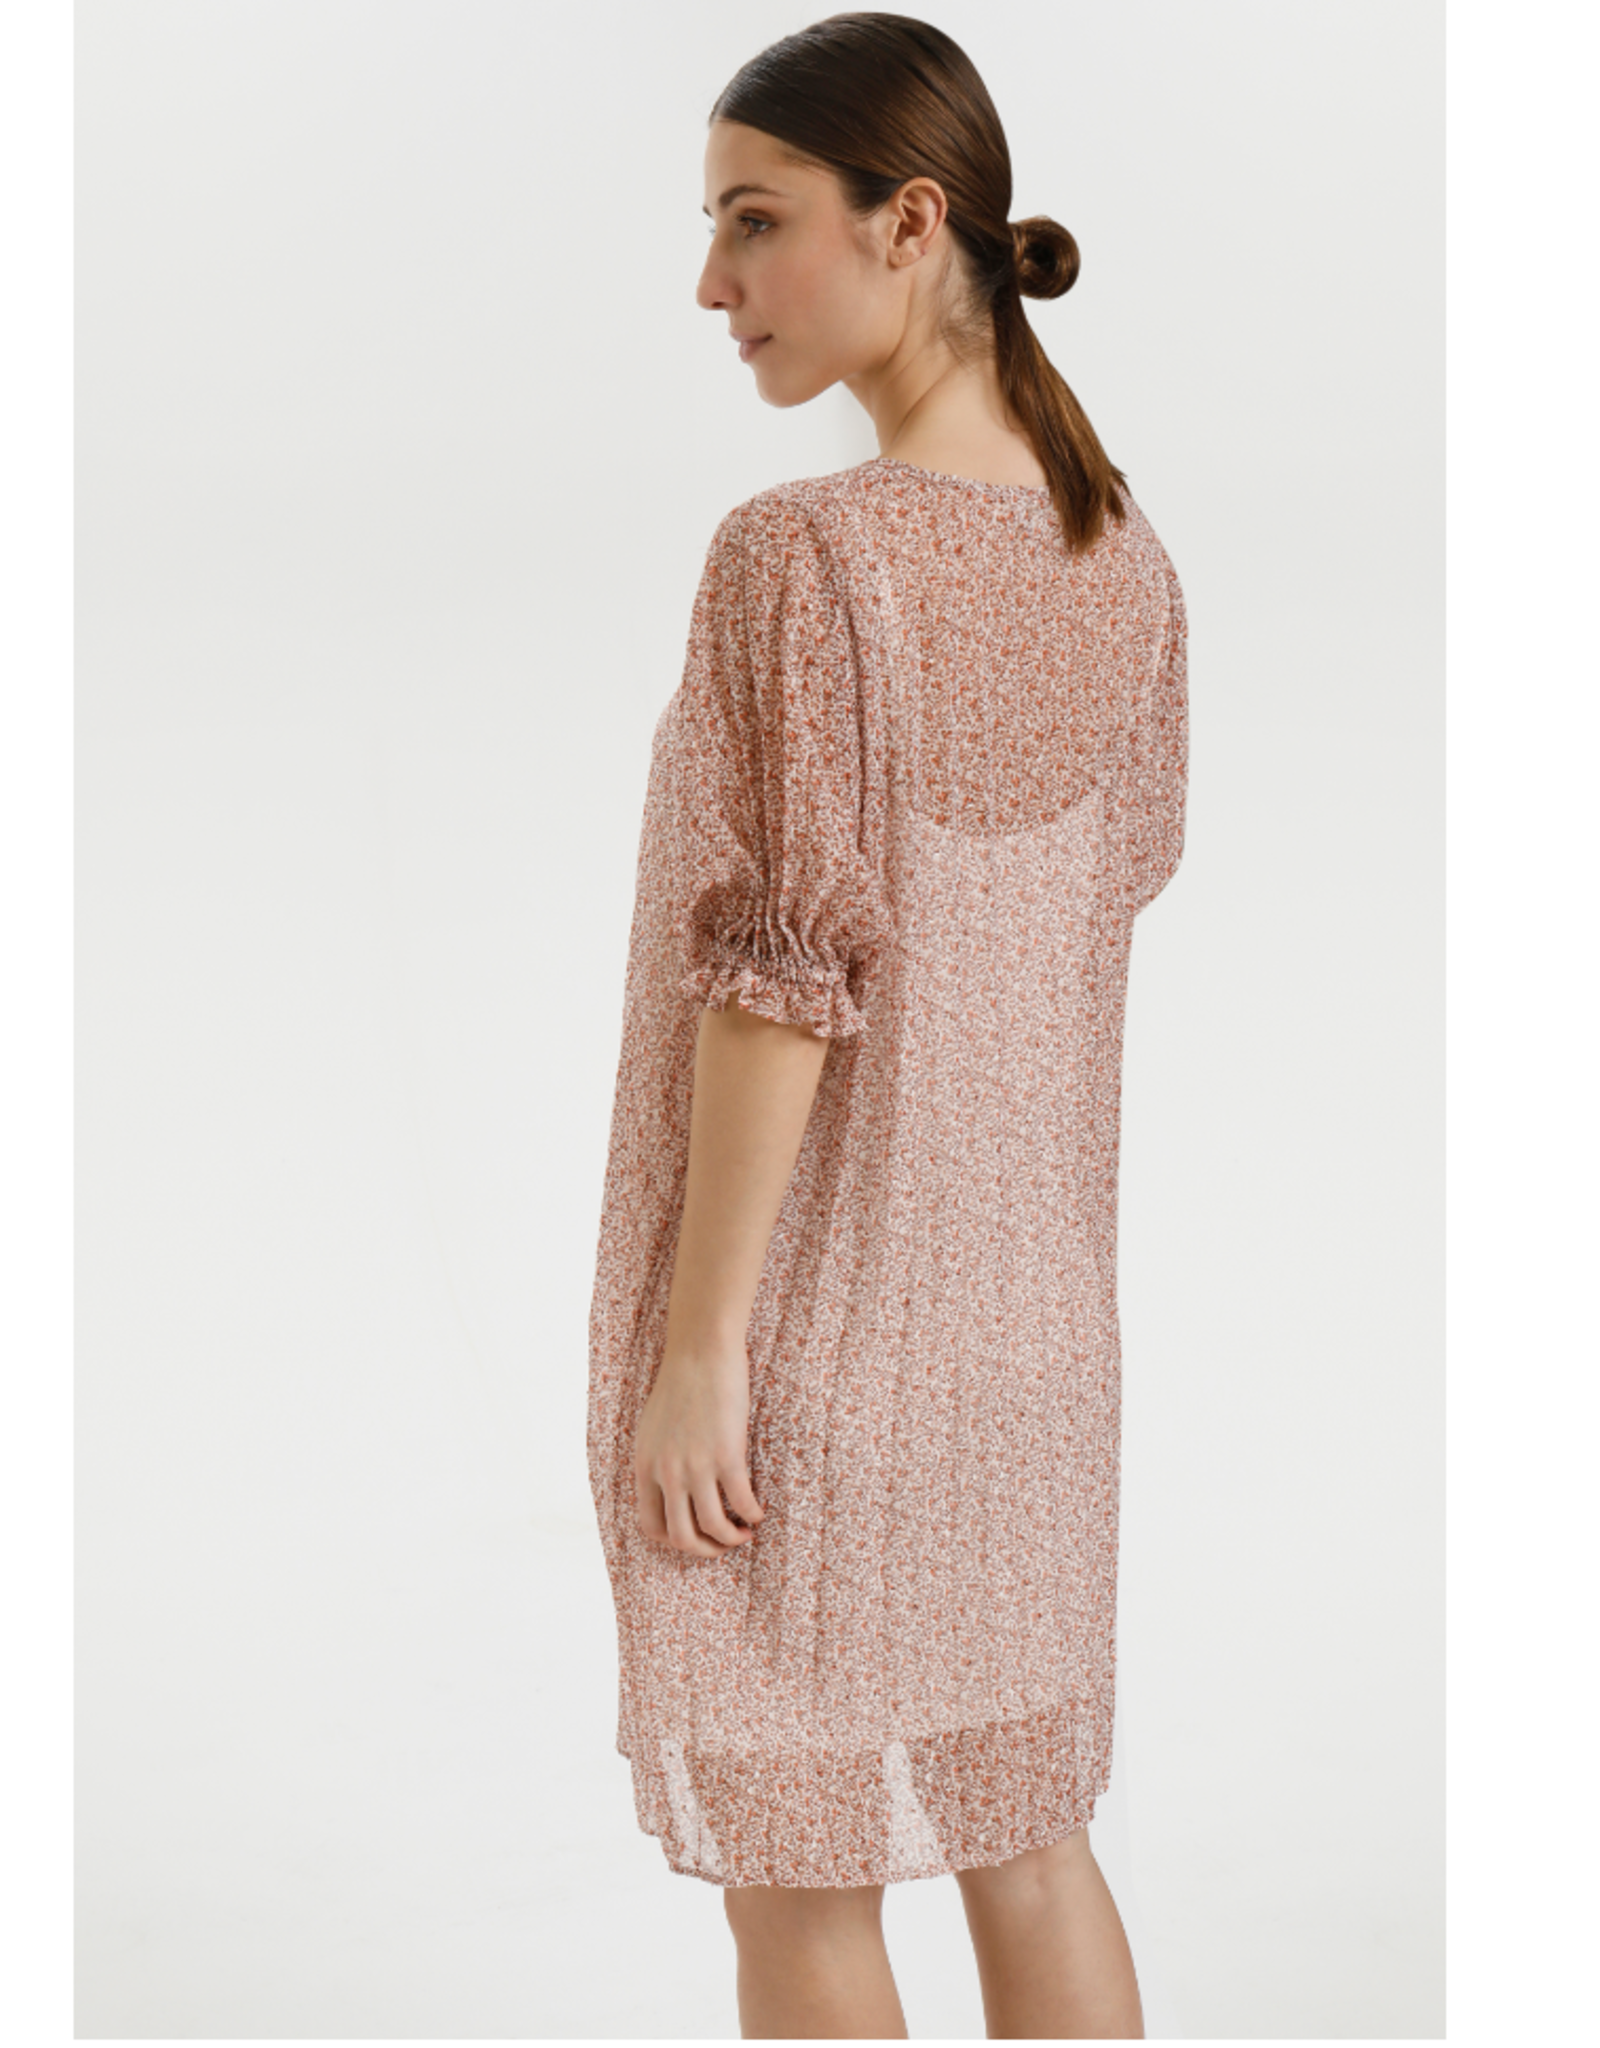 Cream Cream - CRKinia Short Dress